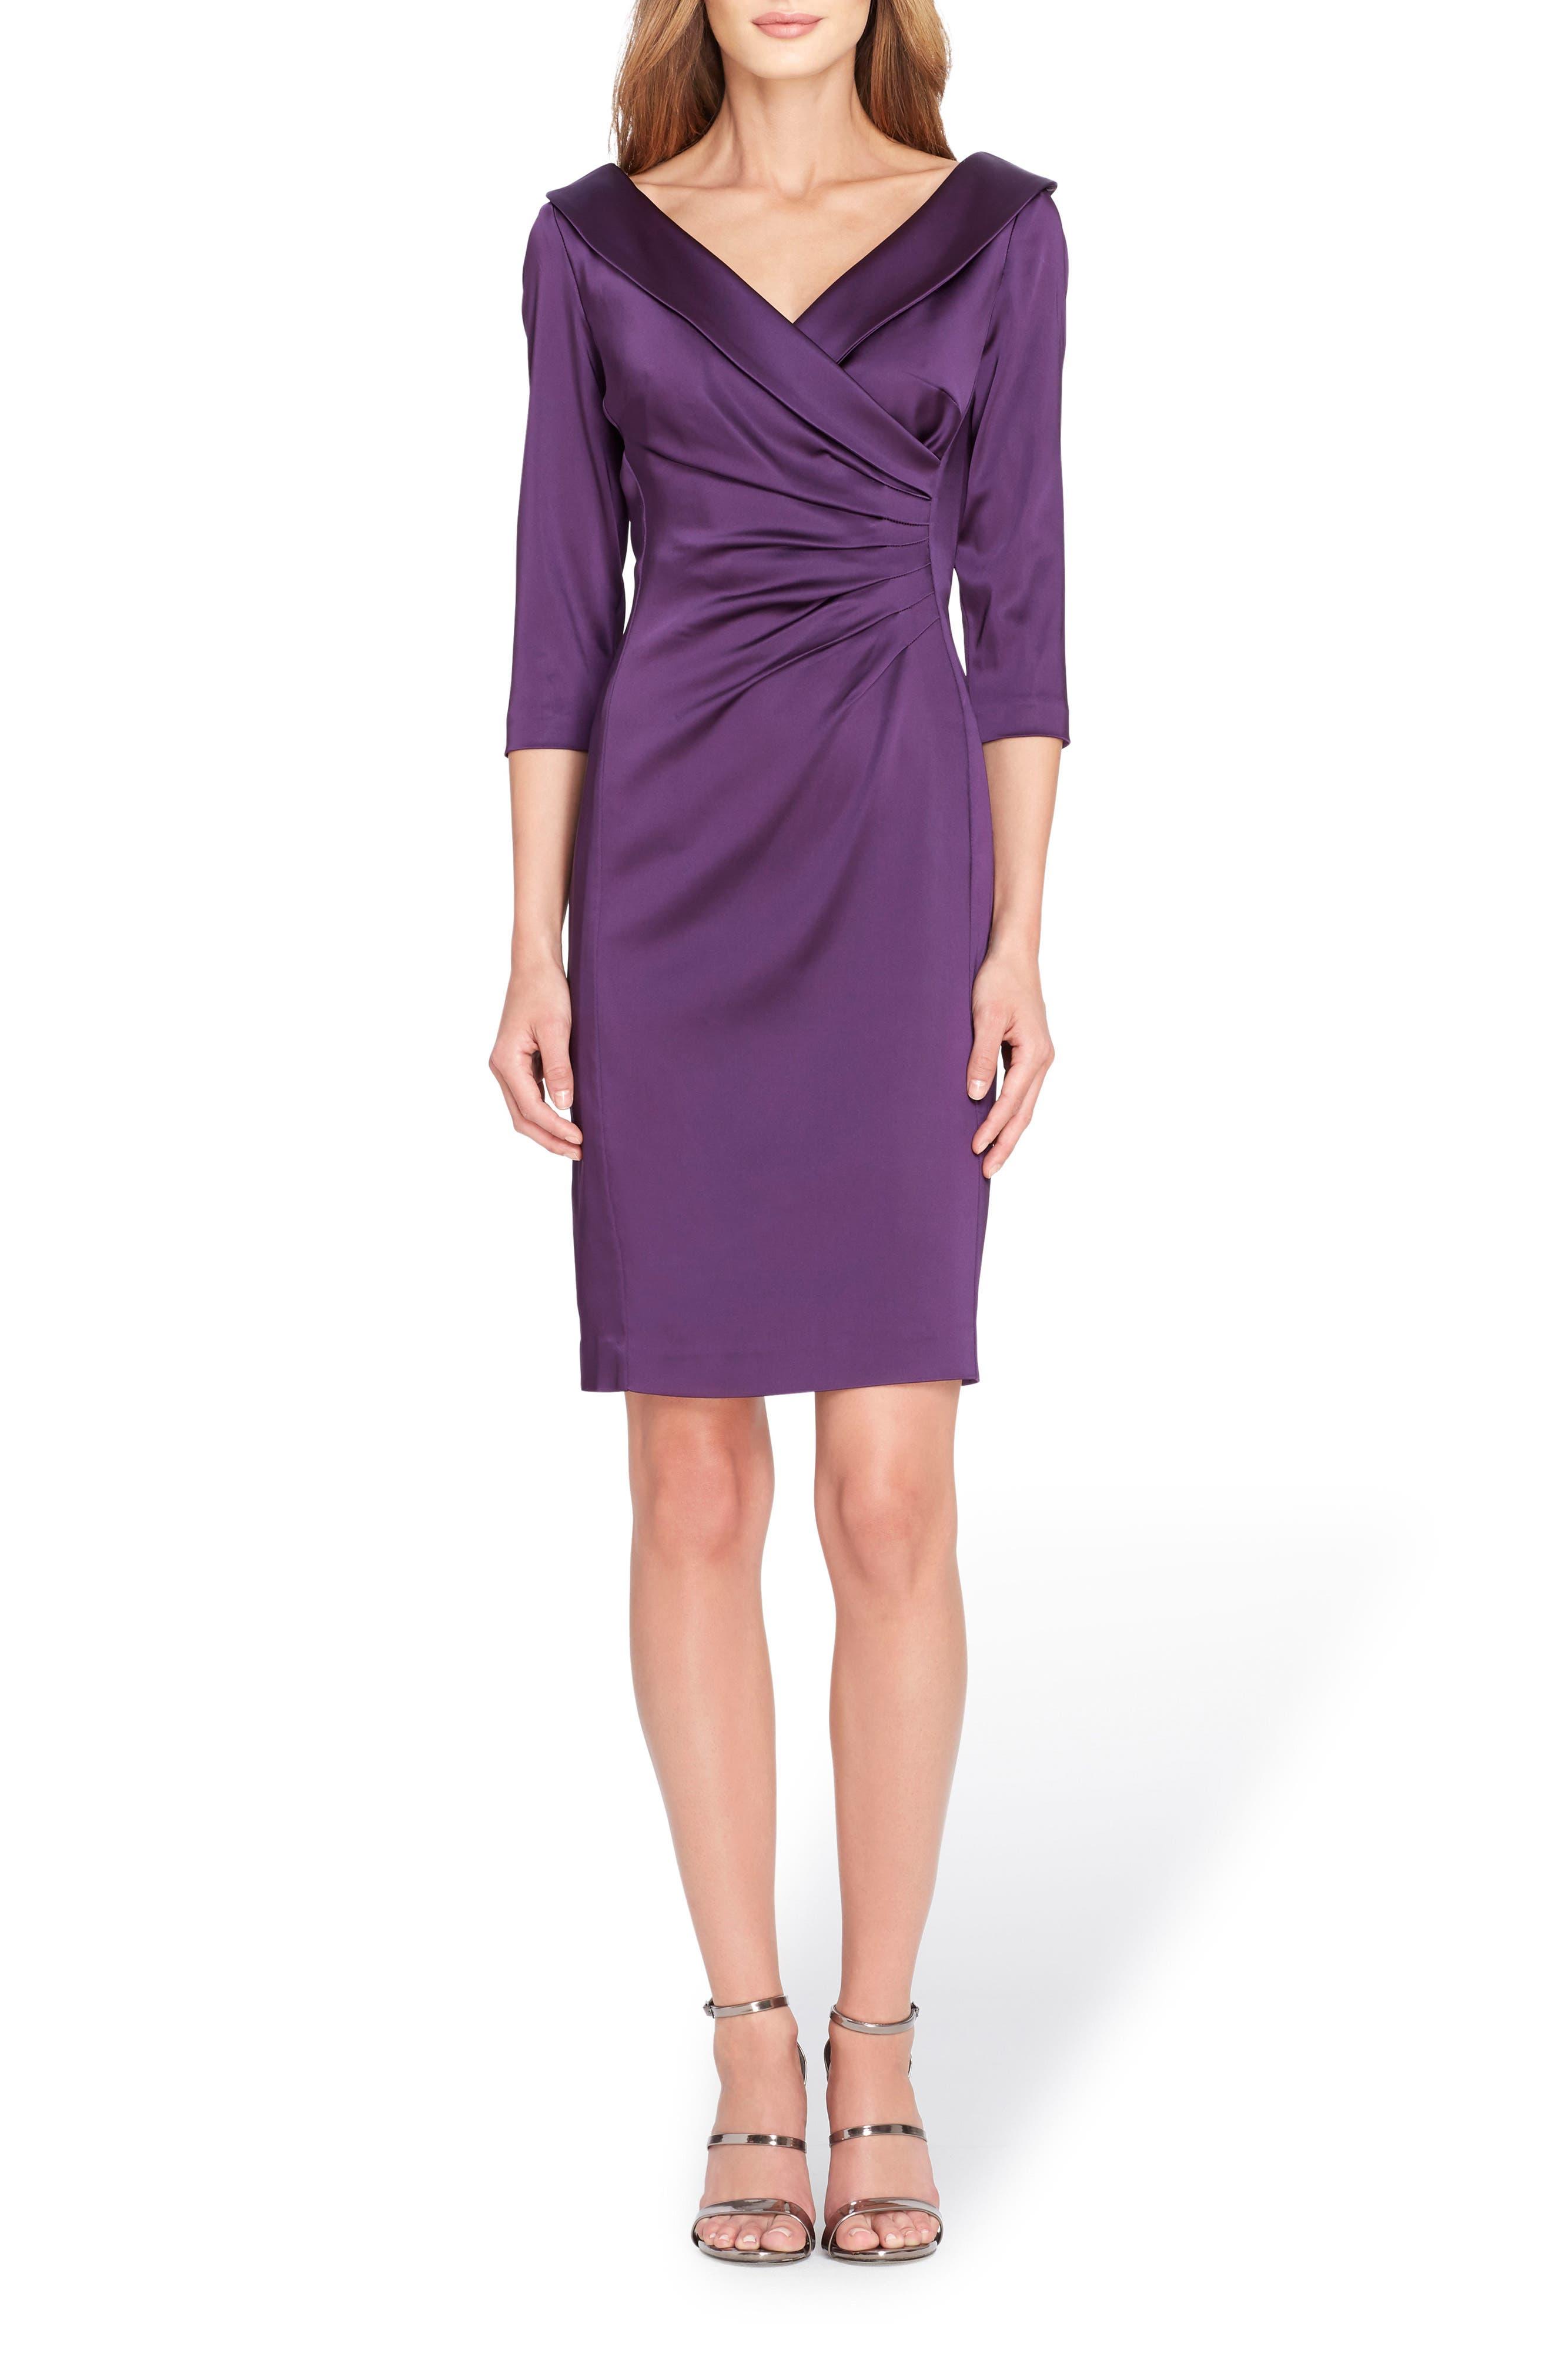 Ruched Stretch Satin Sheath Dress,                         Main,                         color, Plum